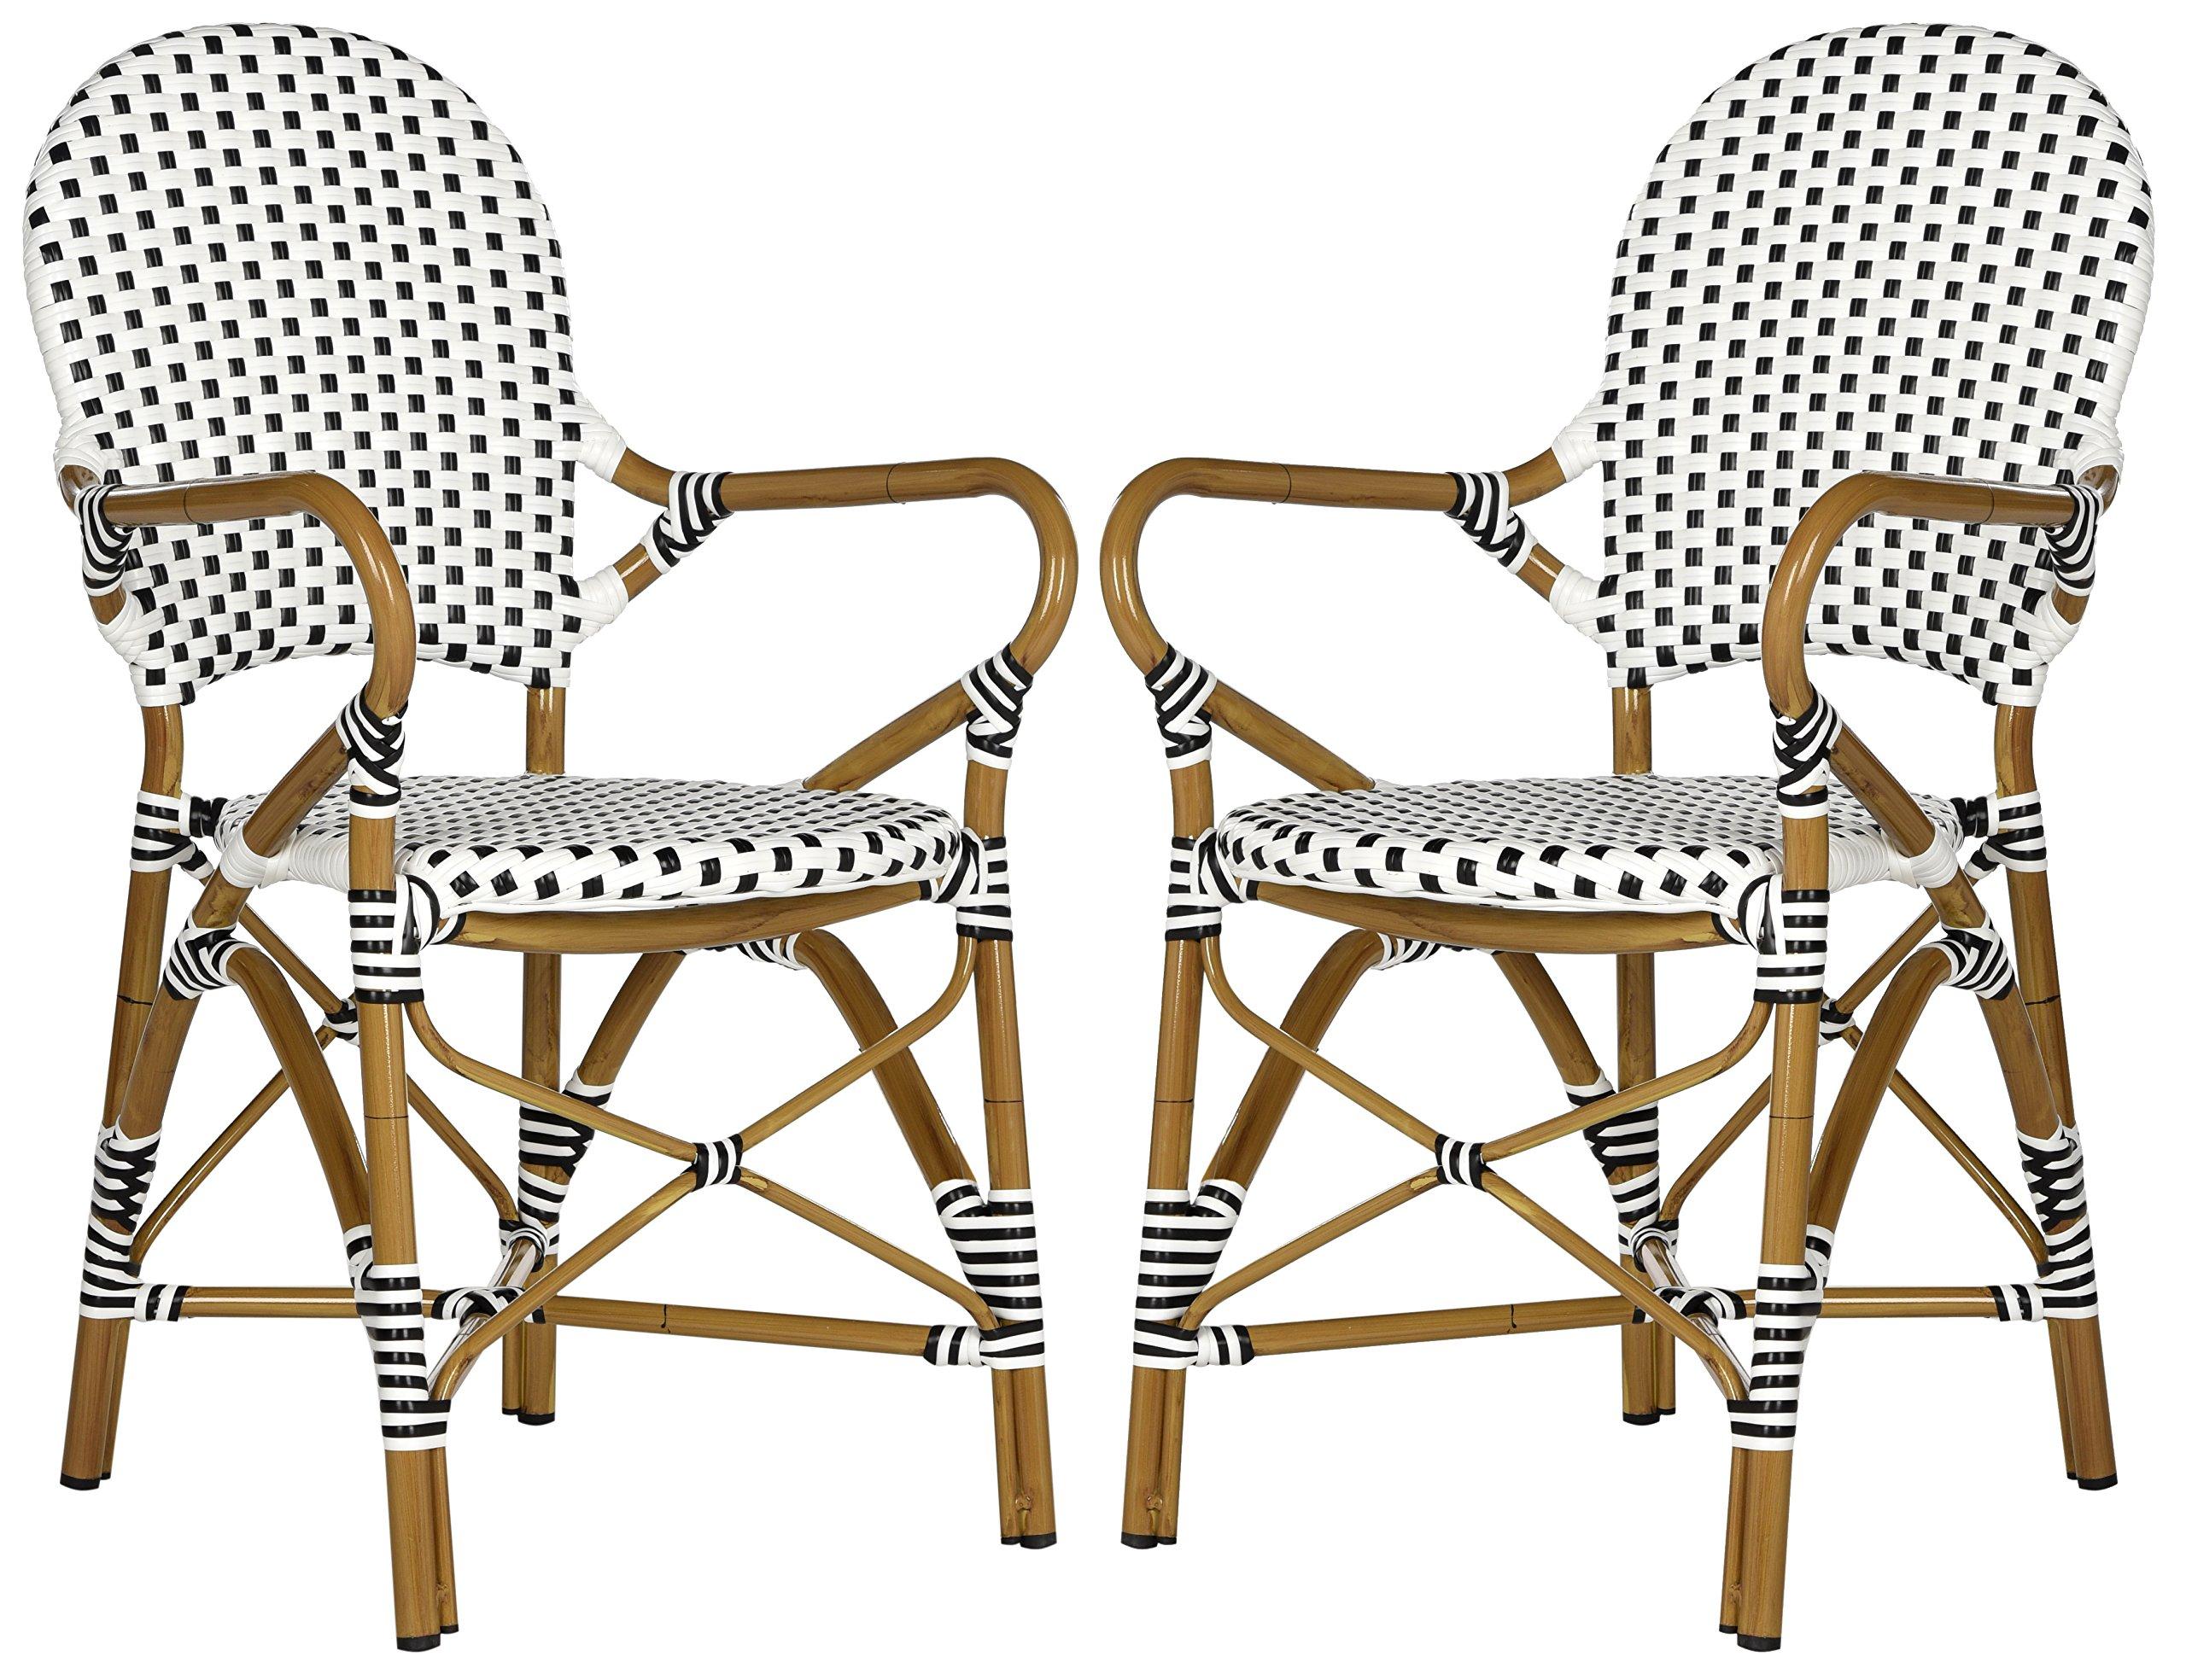 Safavieh Home Collection Hooper Indoor-Outdoor Stacking Arm Chair (Set of 2), Medium Oak/Black